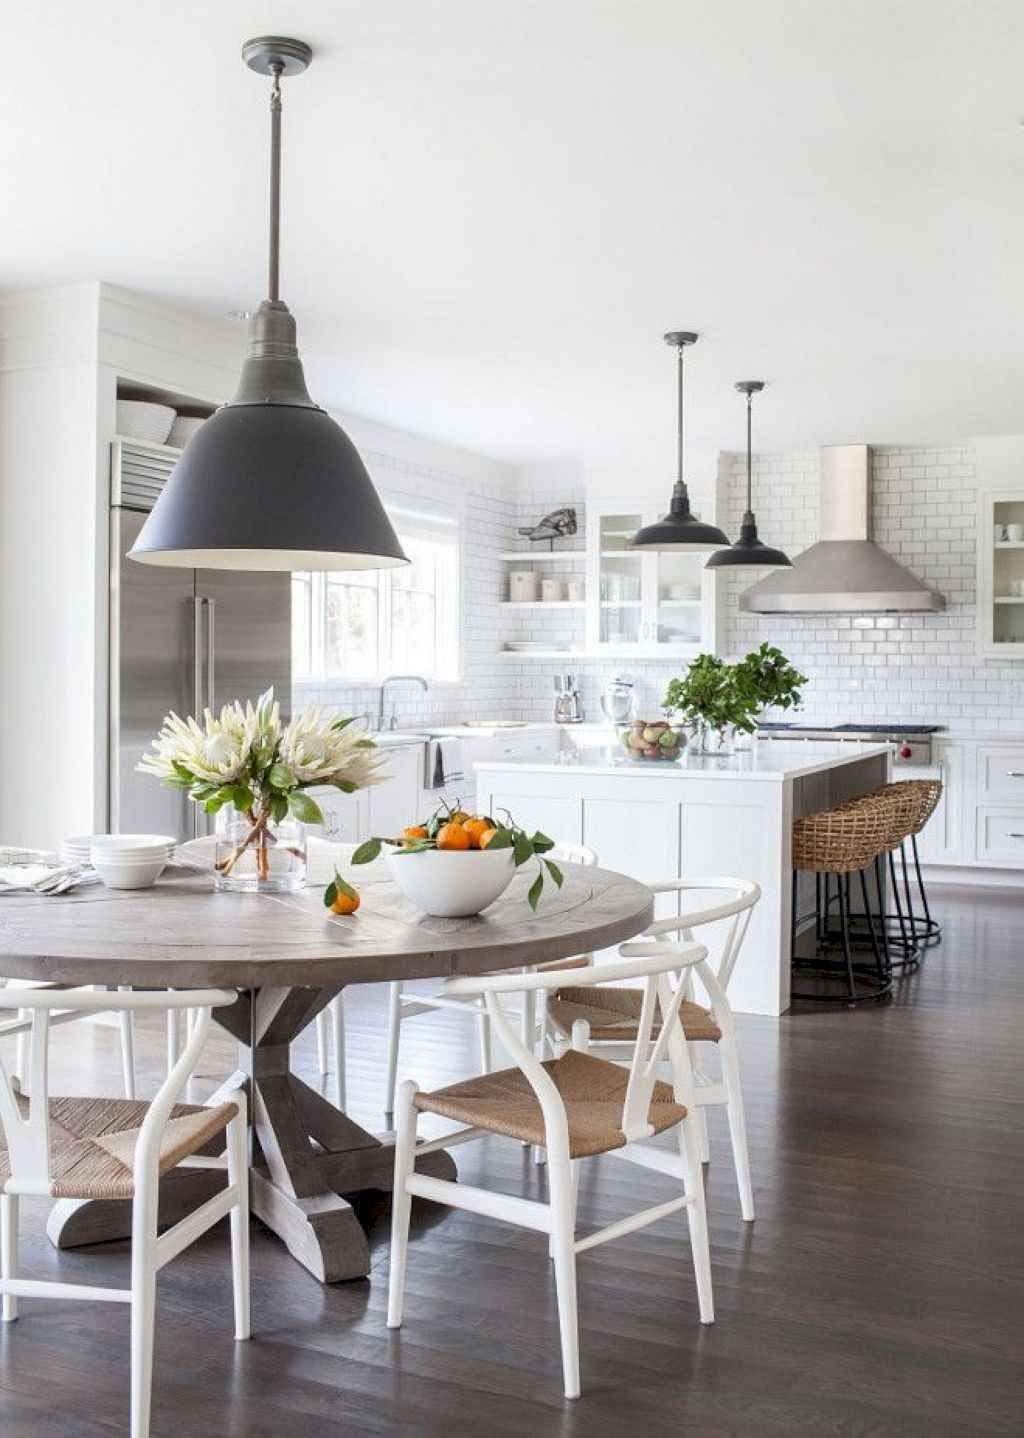 9 Beautiful Farmhouse Dining Room Table Design Ideas ...